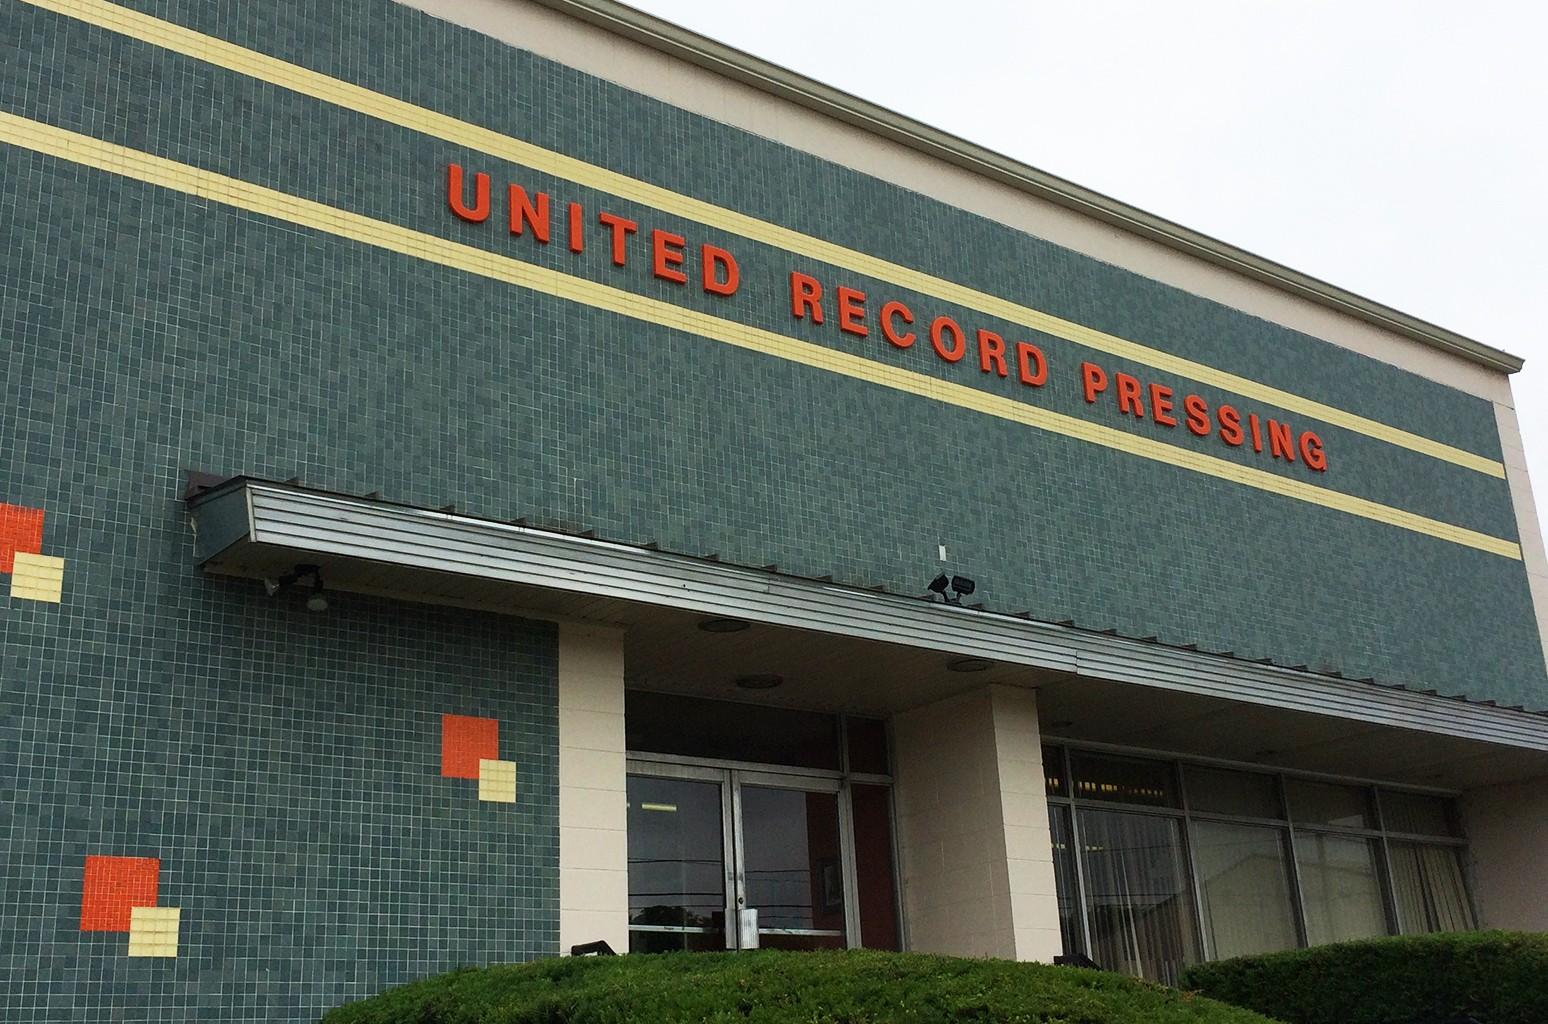 United Record Pressing in Nashville, Tenn.